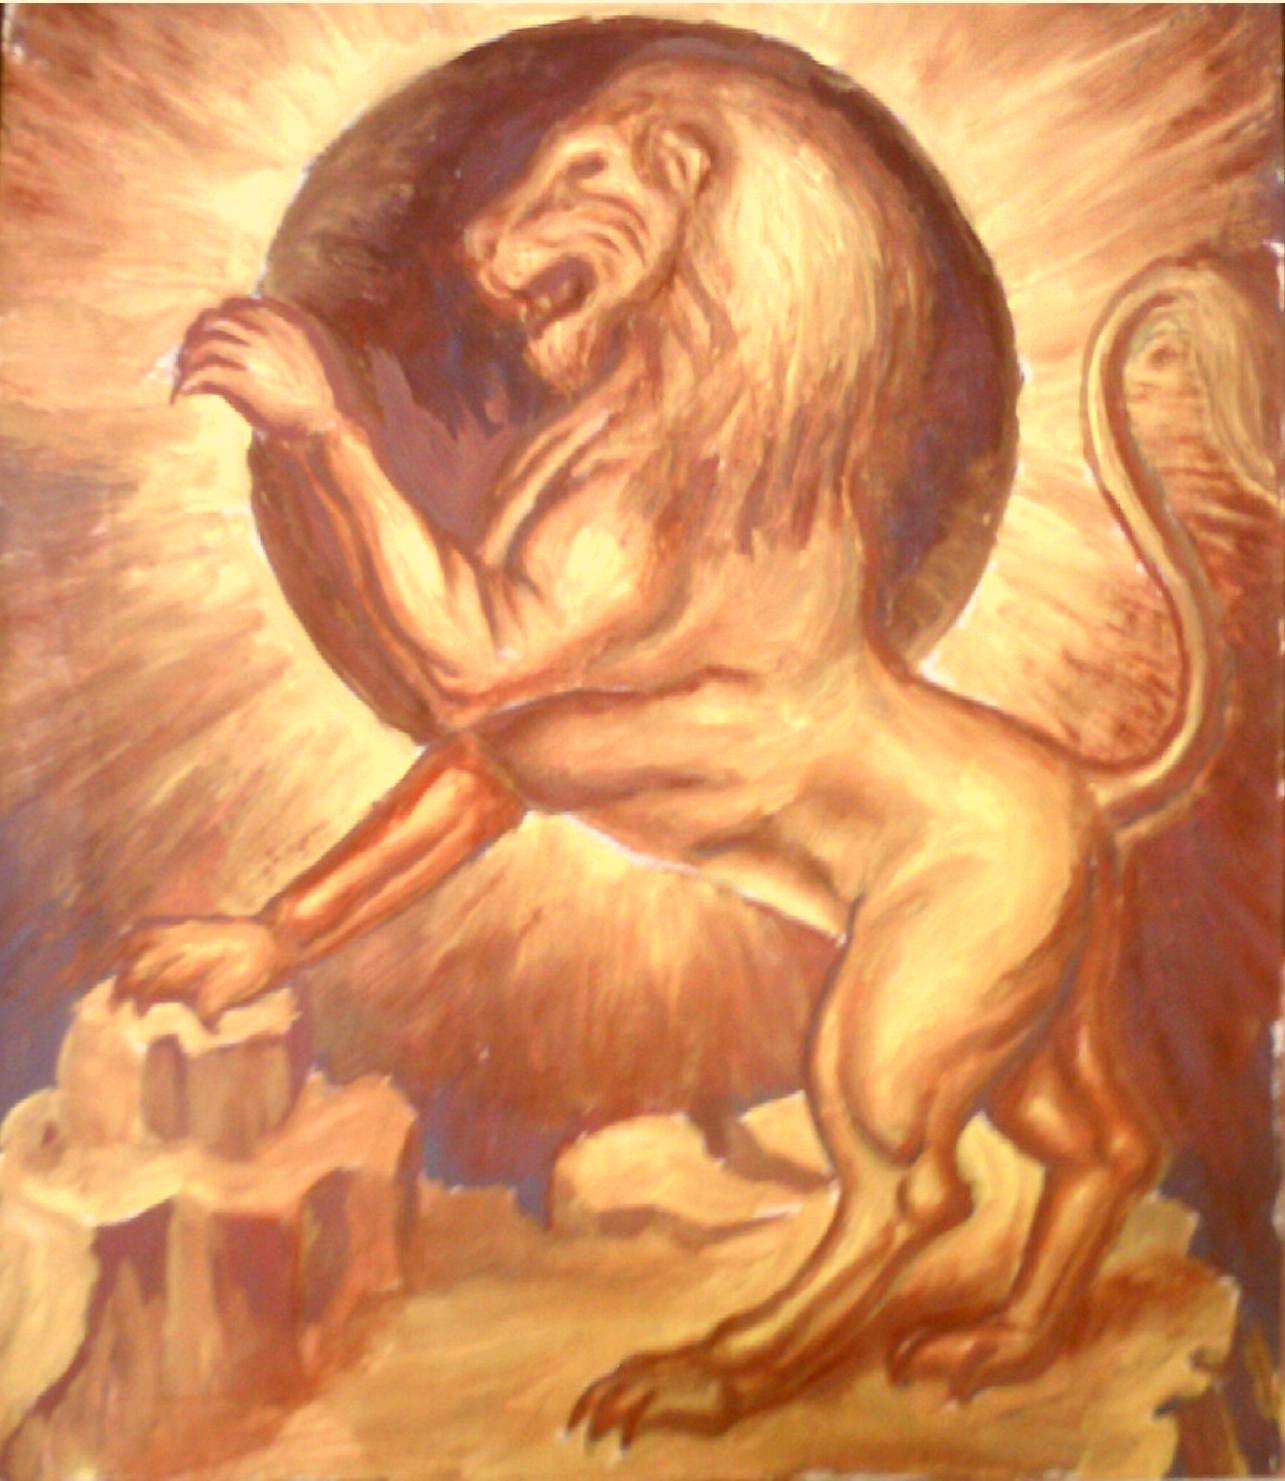 подвиги льва картинки рождения мелани